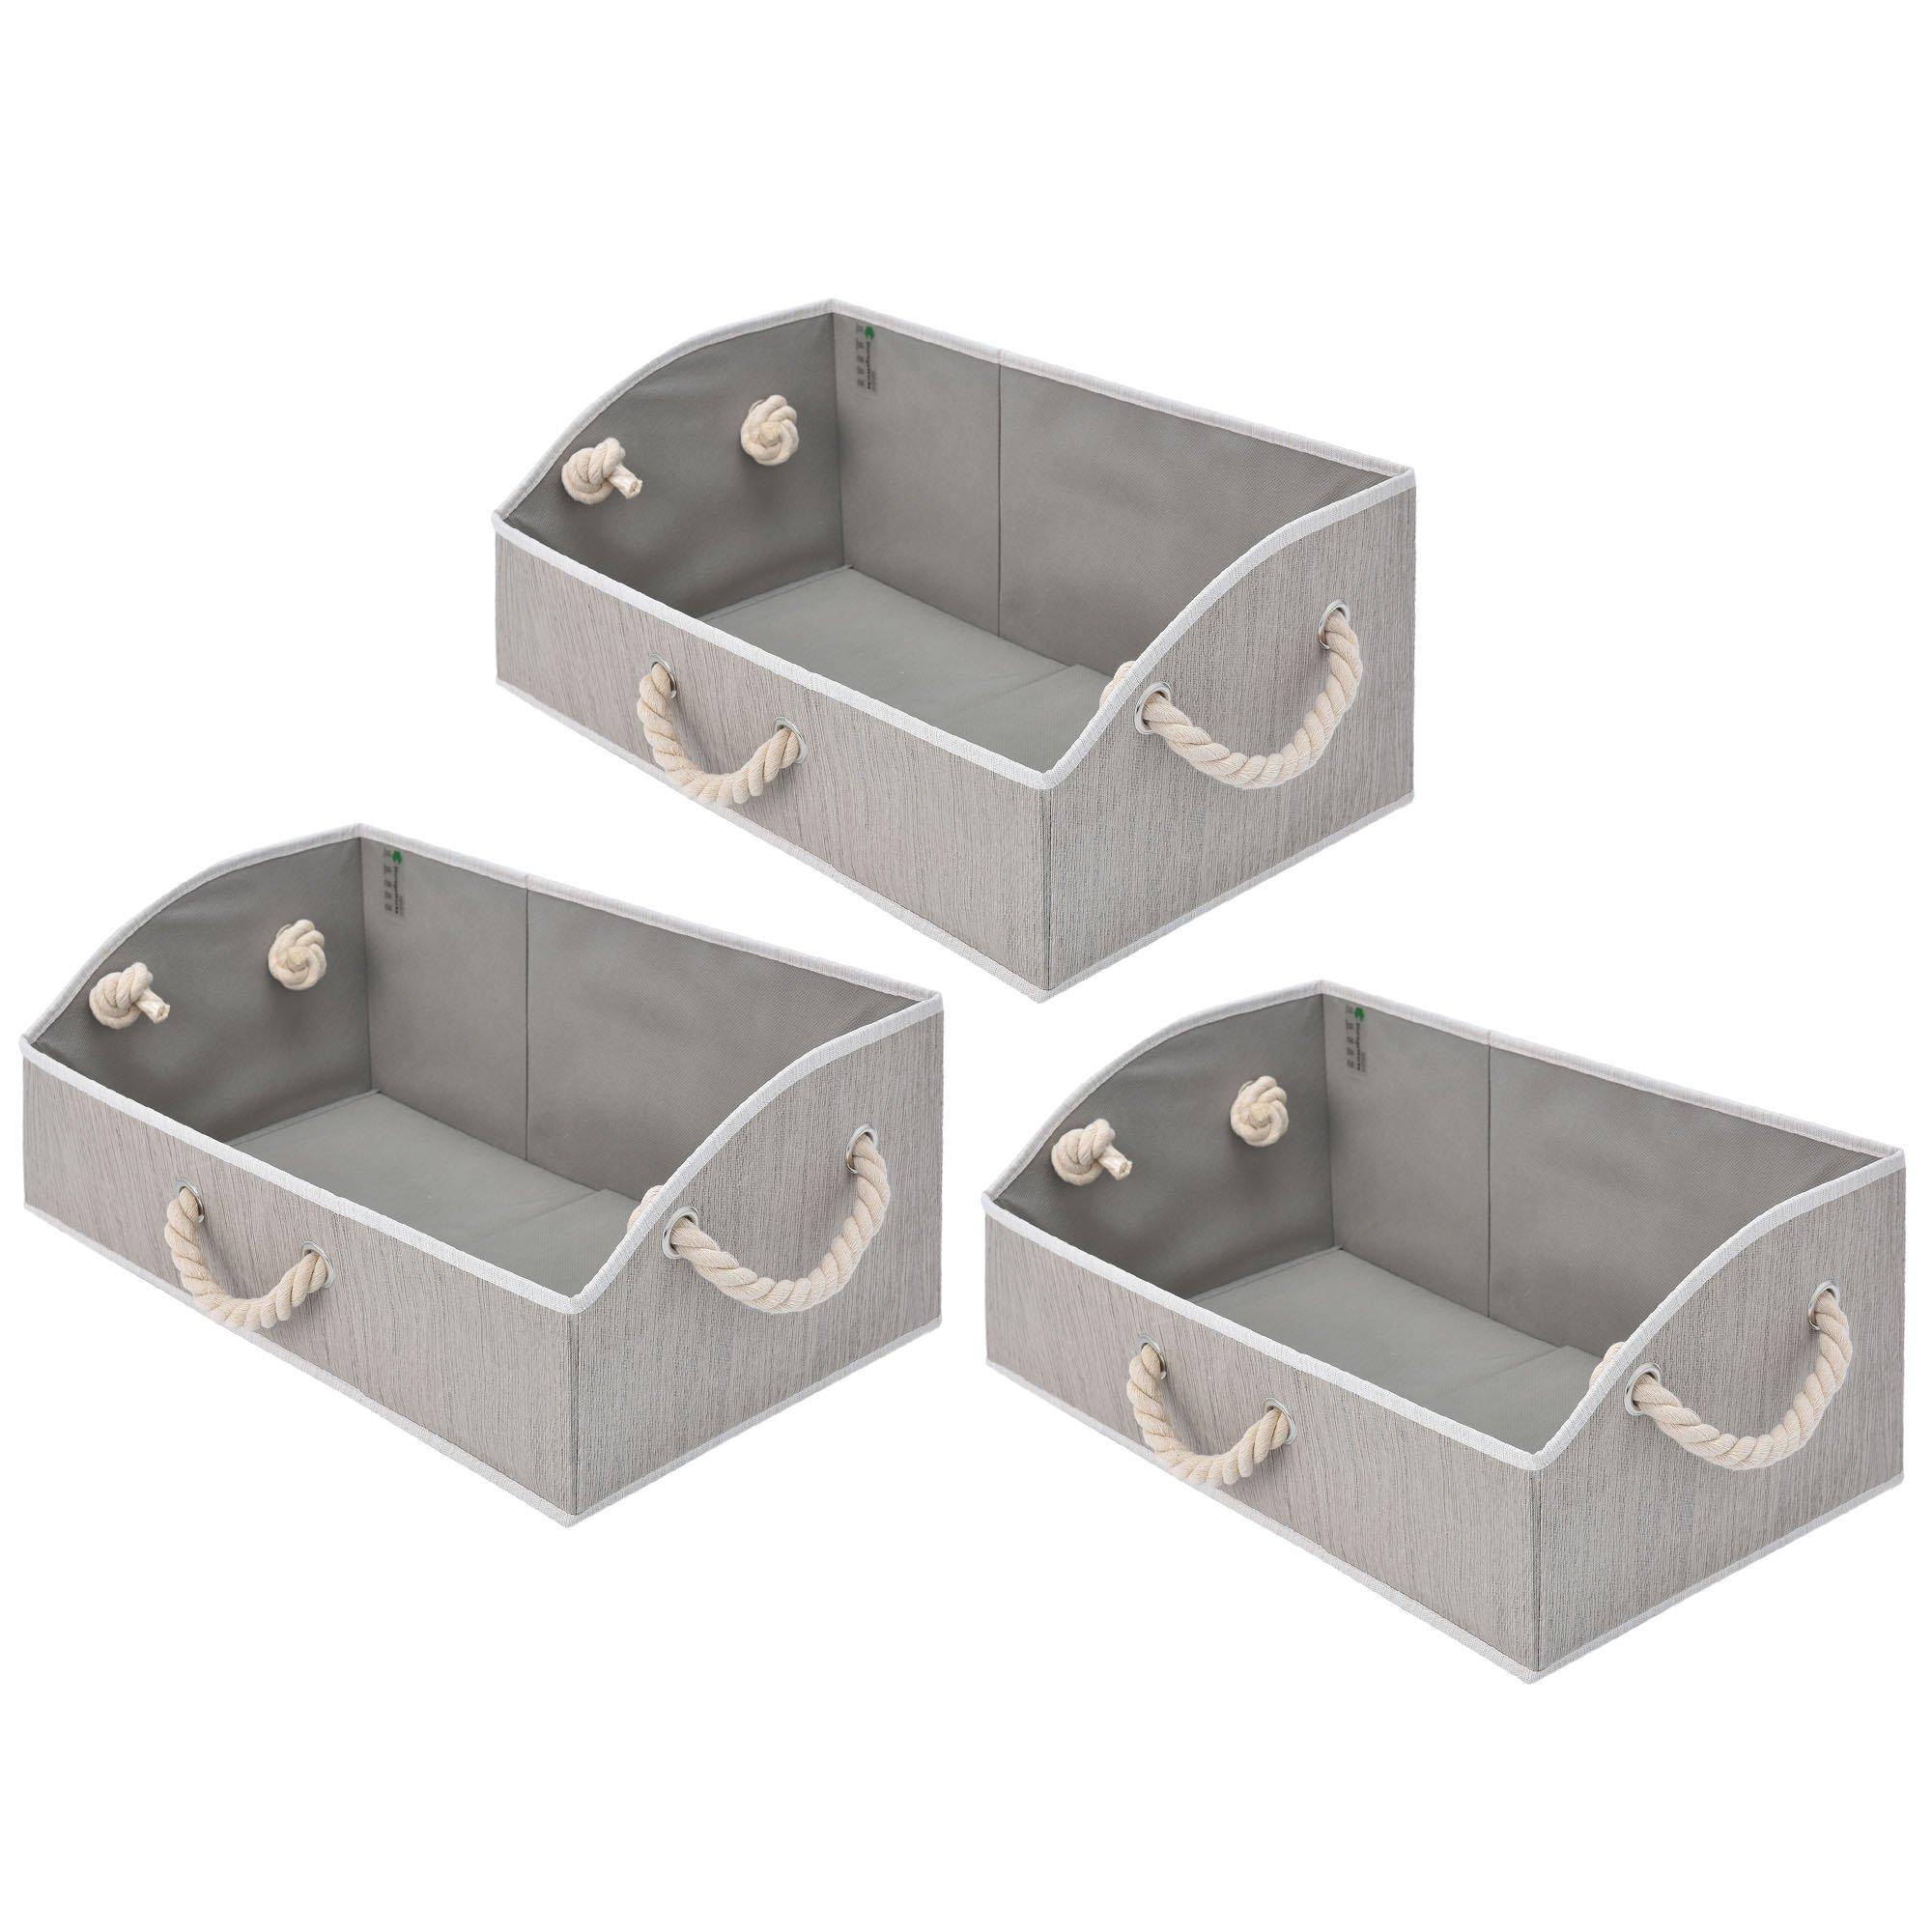 StorageWorks Storage Bins, Fabric Storage Baskets, Foldable Closet Organizer Trapezoid Storage Box, Bamboo Style, Gray, EX-Jumbo, 3-Pack